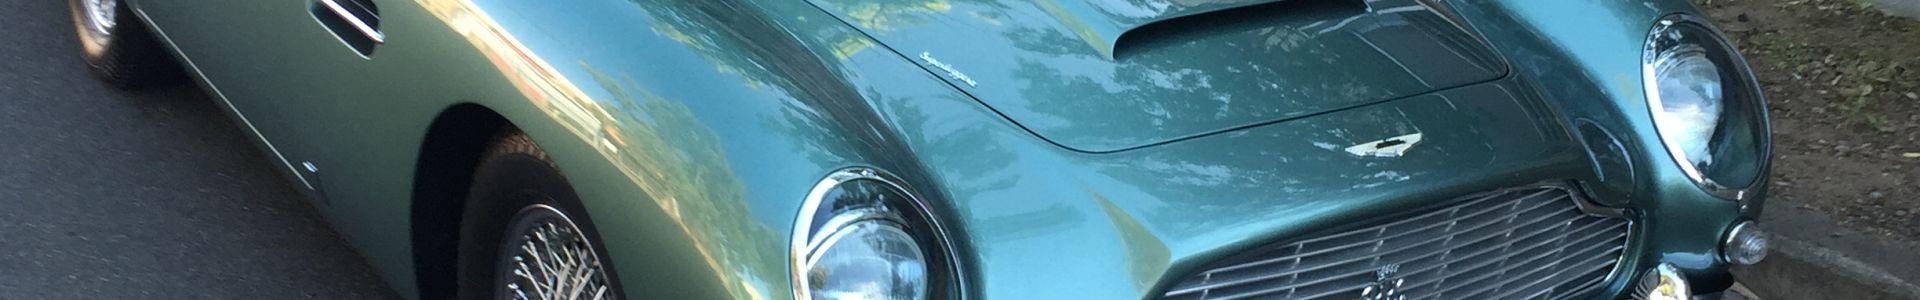 Aston Martin DB5 9